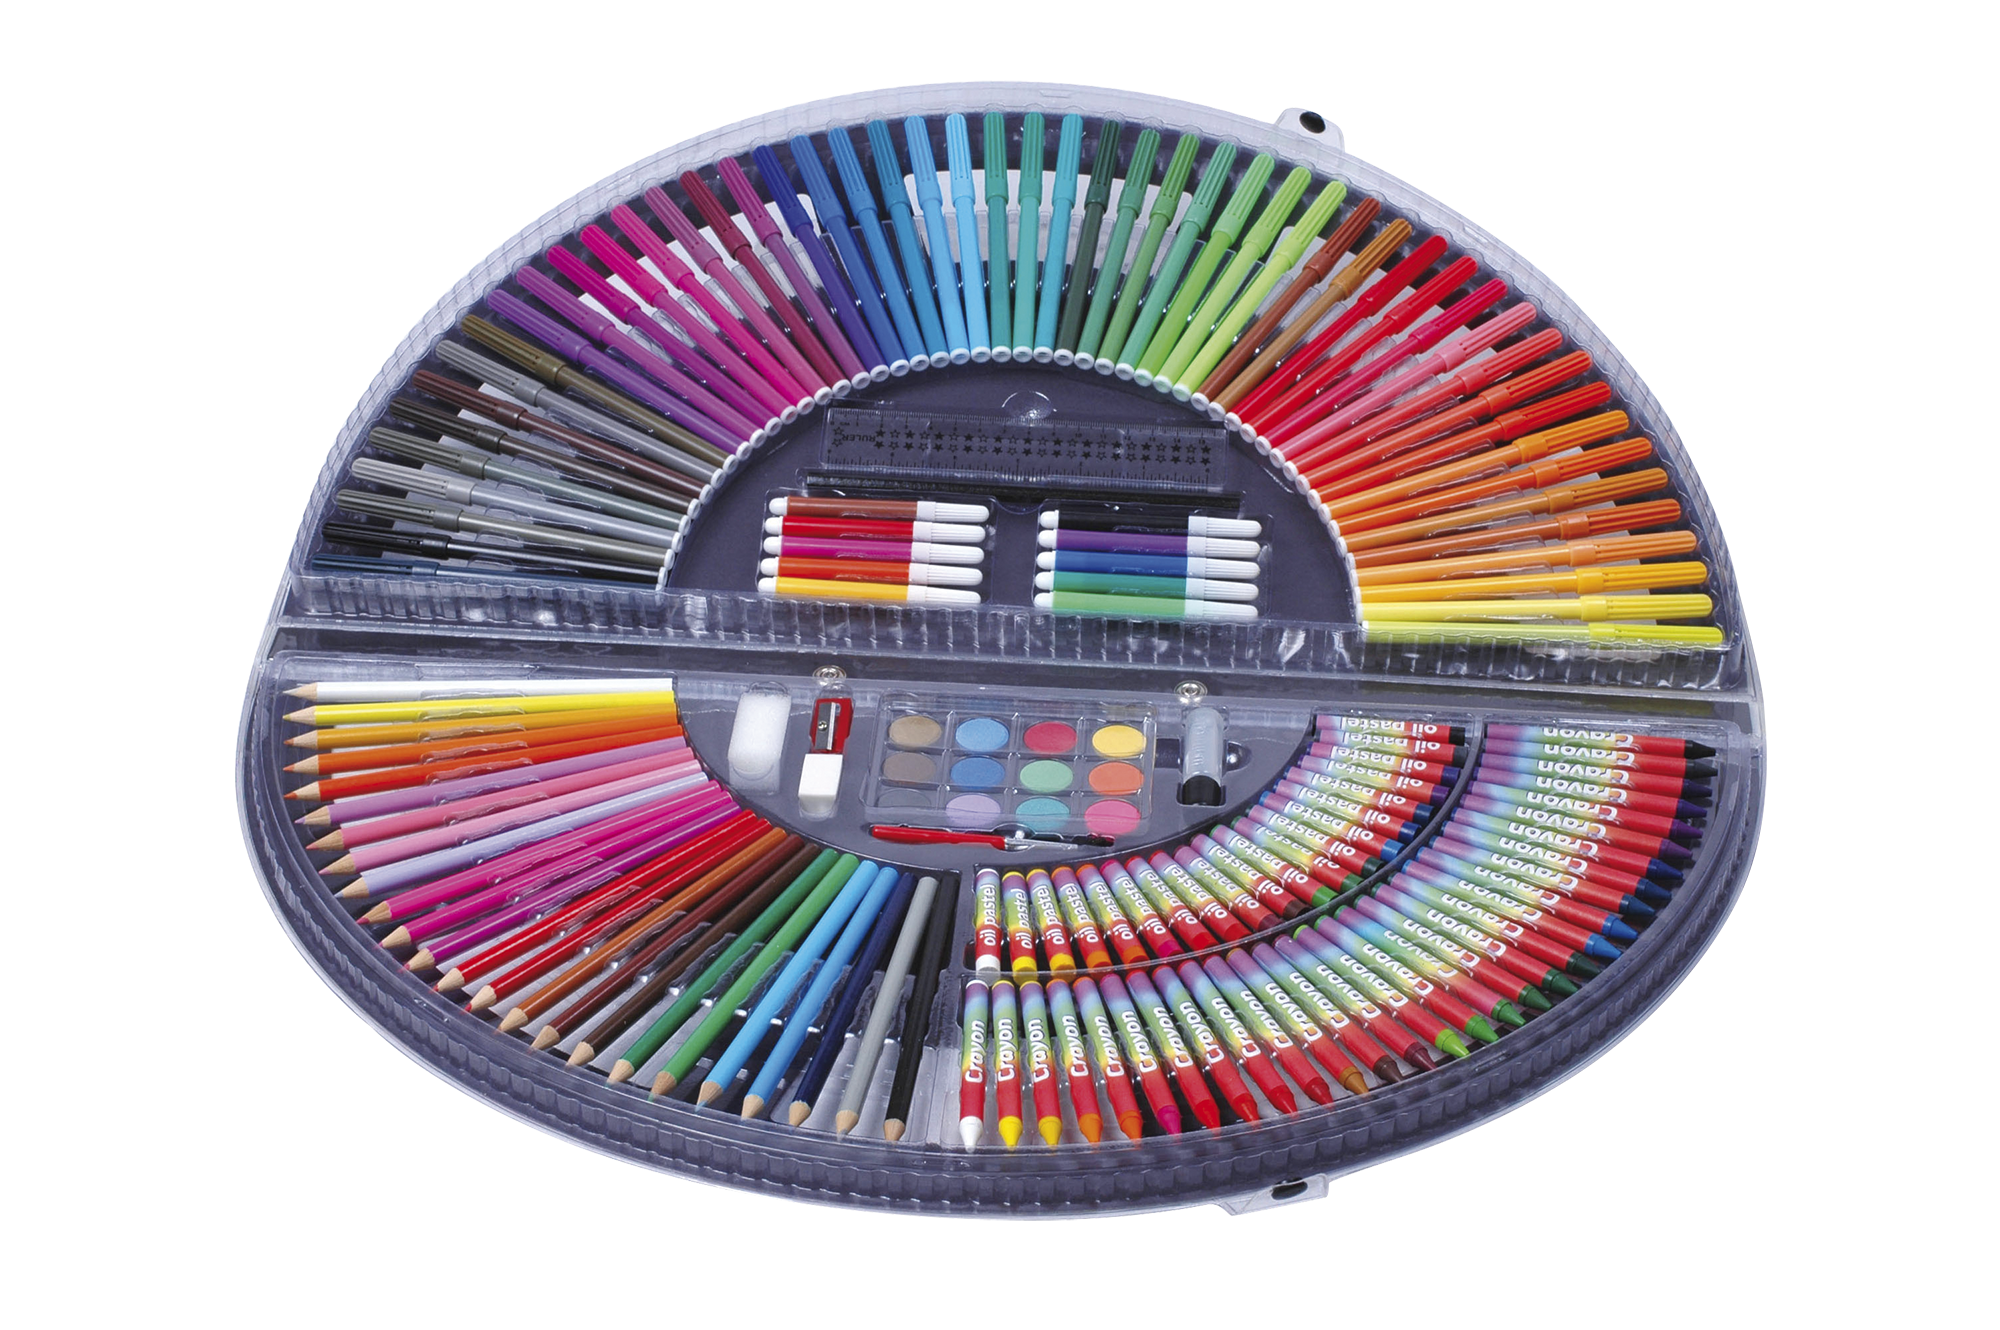 Creamania Βαλιτσάκι Χρώματα 153 τμχ